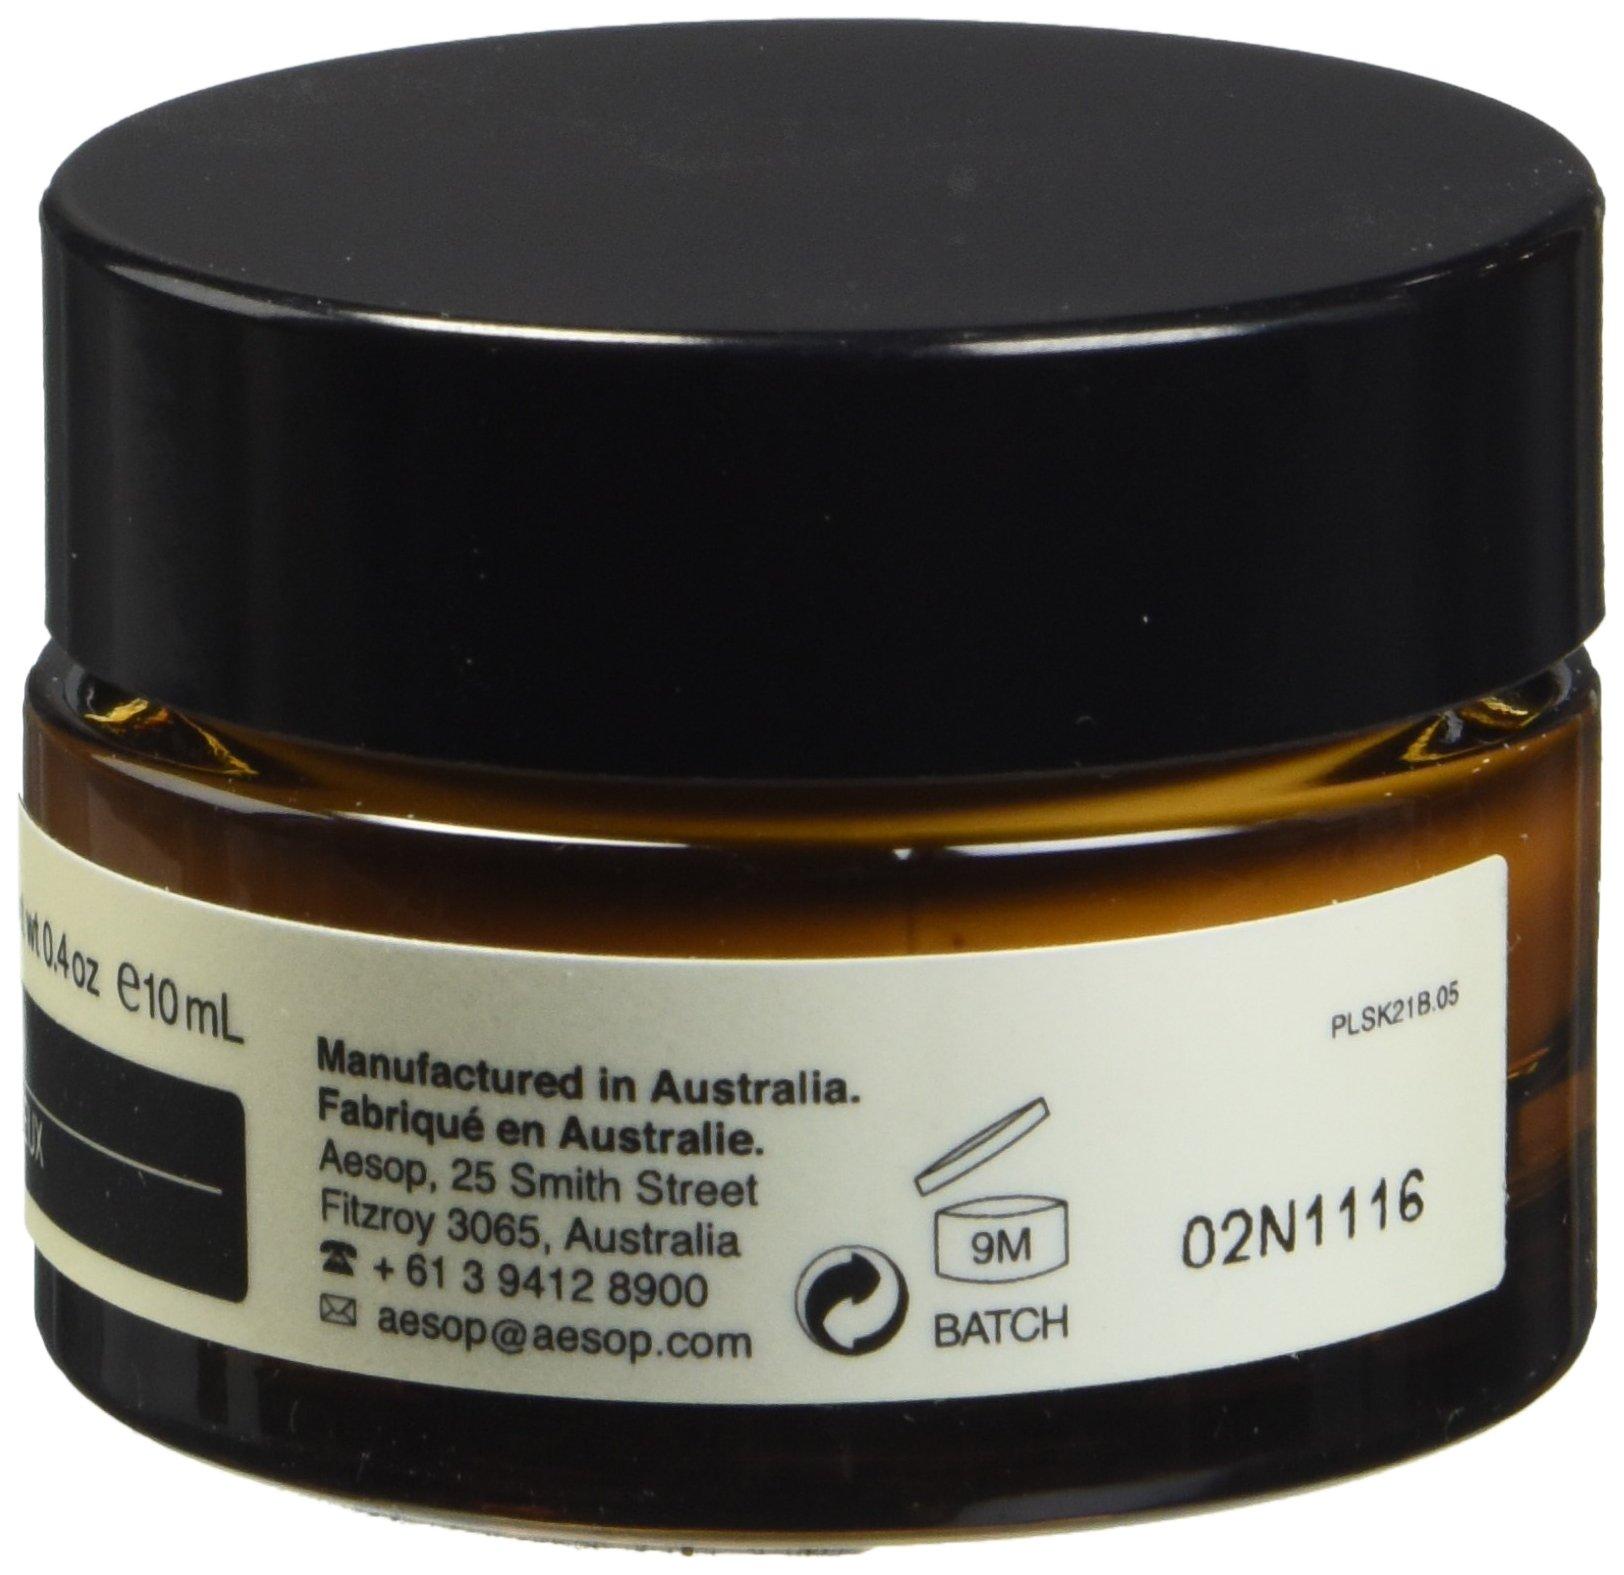 Aesop Parsley Seed Anti-Oxidant Eye Cream, 0.33 Ounce by Aesop (Image #4)